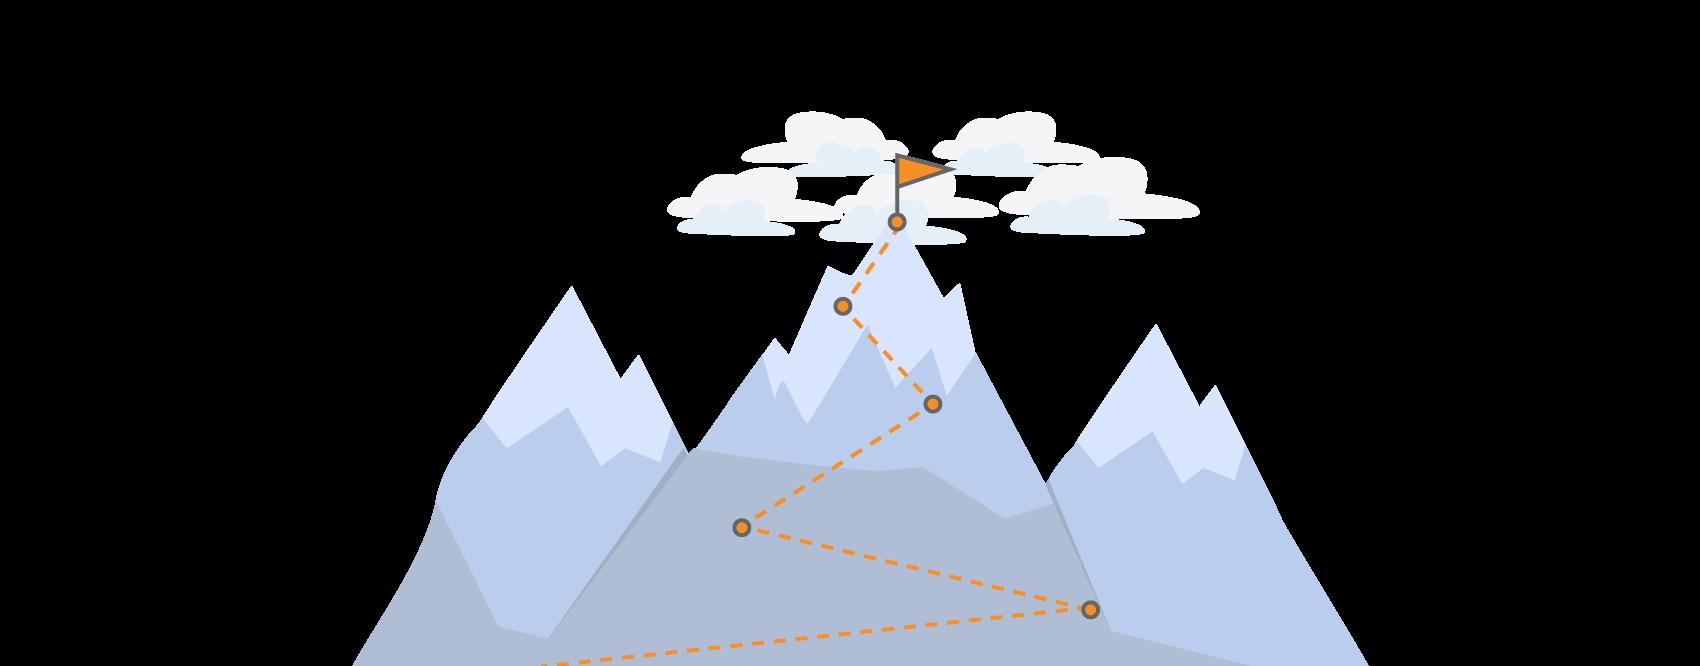 Atlassian-Cloud-Migrations-BKG